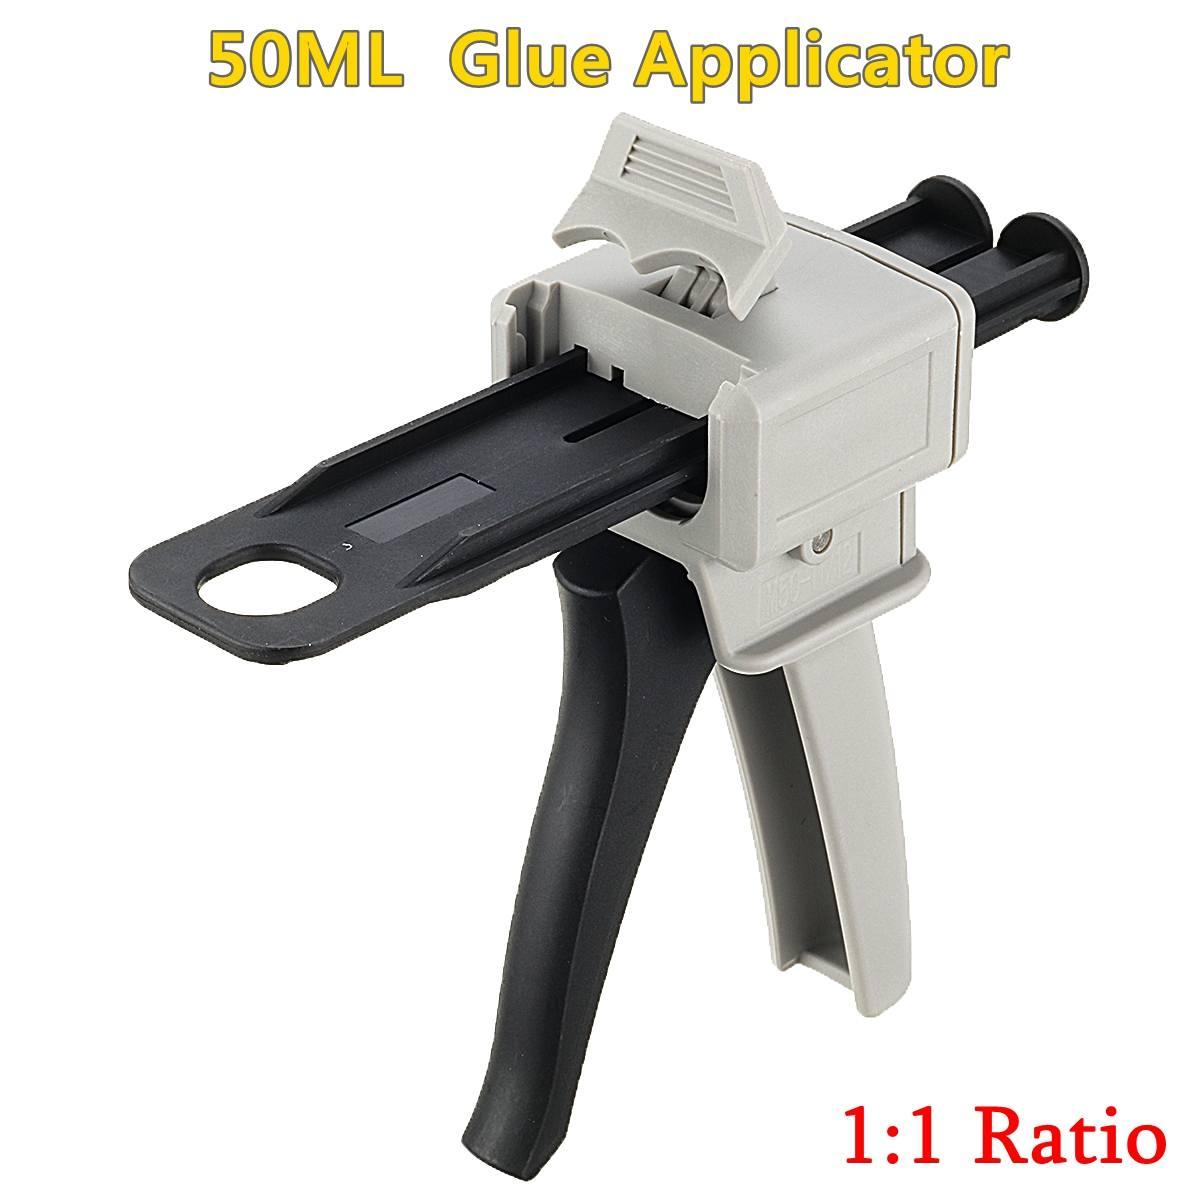 Glue Guns 50ml Two Component AB Epoxy Sealant Glue Applicator Glue Adhensive Squeeze Mixed 1:1 Manual Guns Dispenser